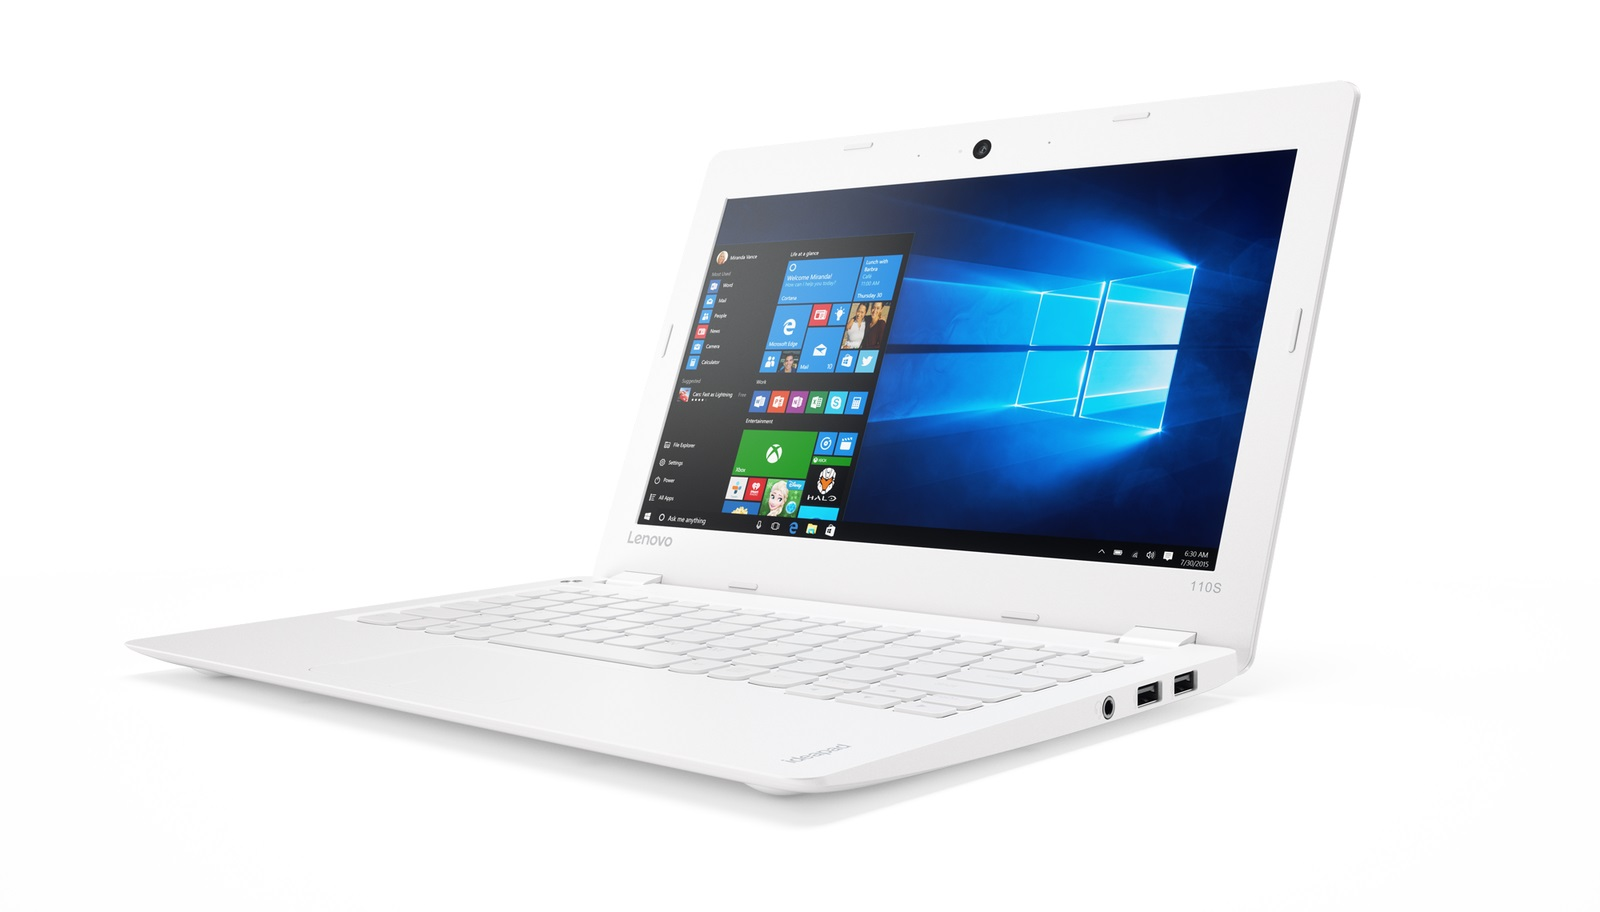 "Lenovo IdeaPad 110S-11IBR Celeron N3060 2,48GHz/2GB/32GB eMMC/11,6"" HD/AG/WIN10 bílá 80WG008GCK"